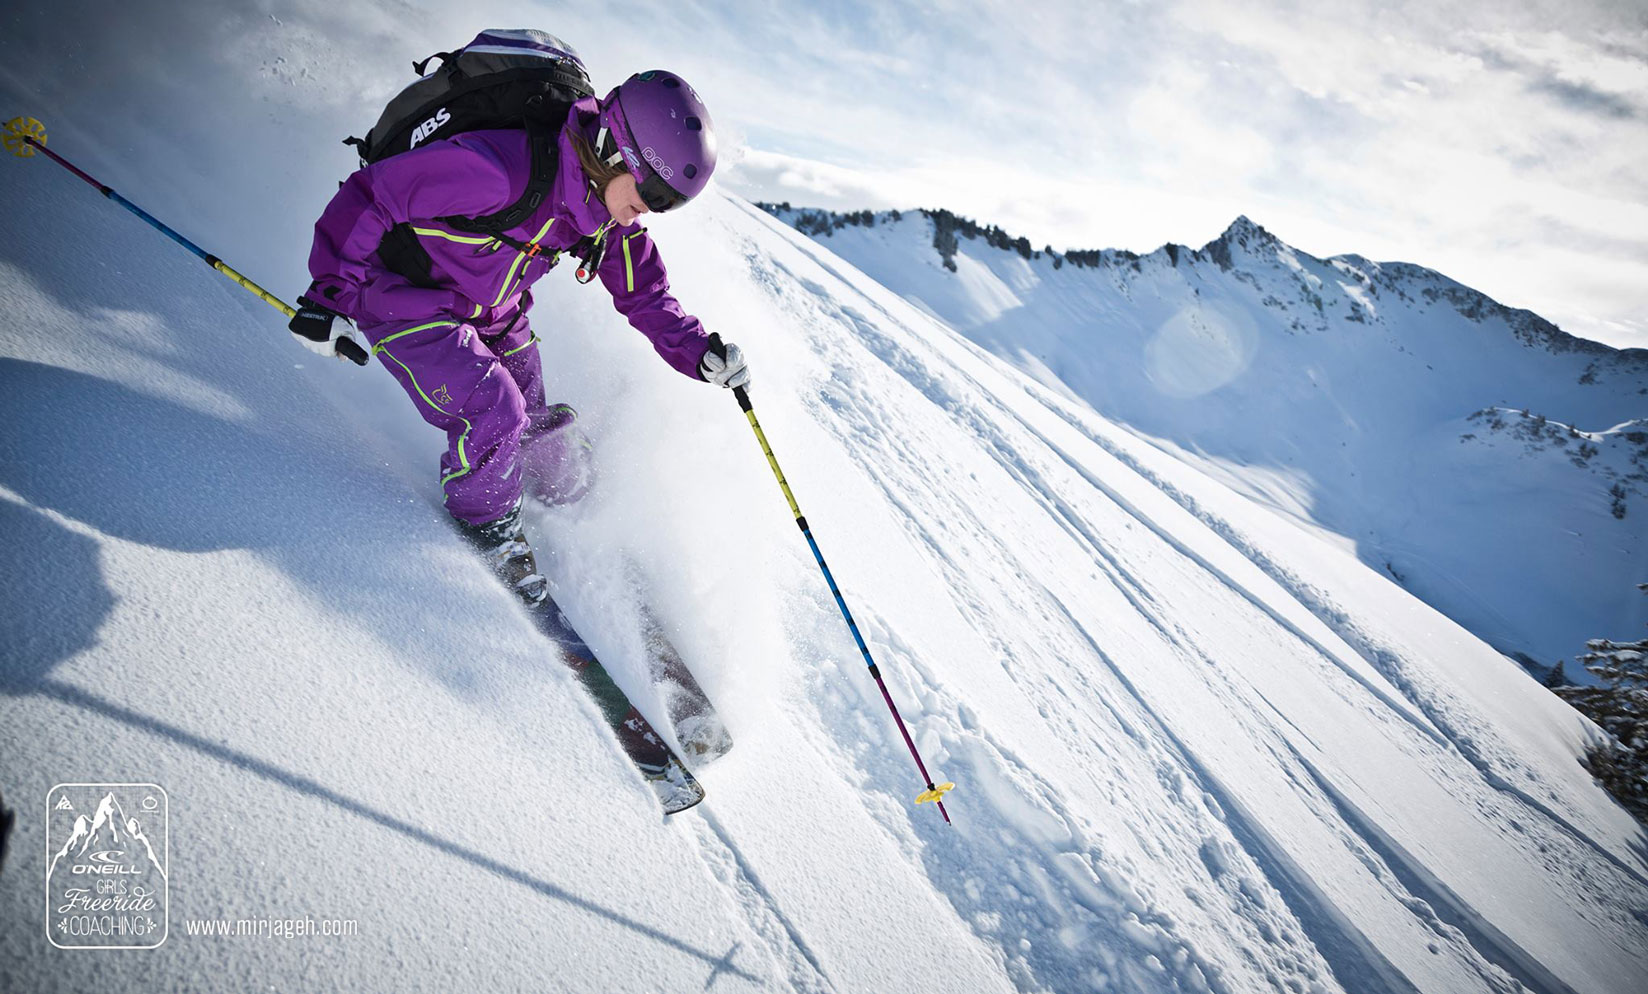 Freeriden Wandern Mountainbiken Powdern-Damuels-ski-freeriden-munichmountaingirls-katharina-kestler